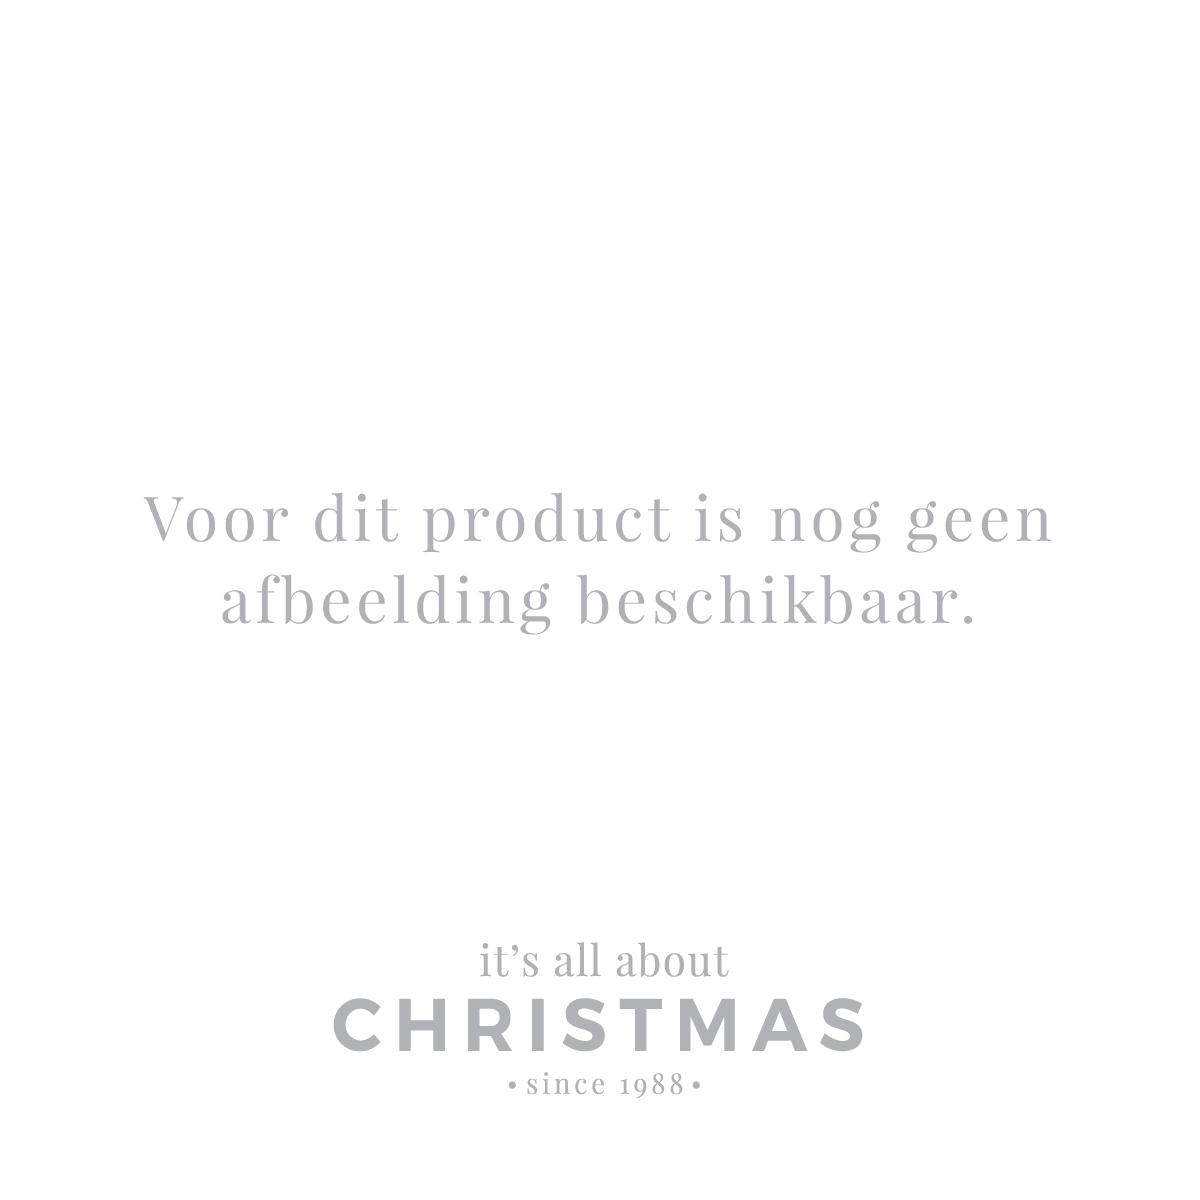 Sneeuwbol - Kerstman/beer met muziek - 14,5cm - Rood/Wit